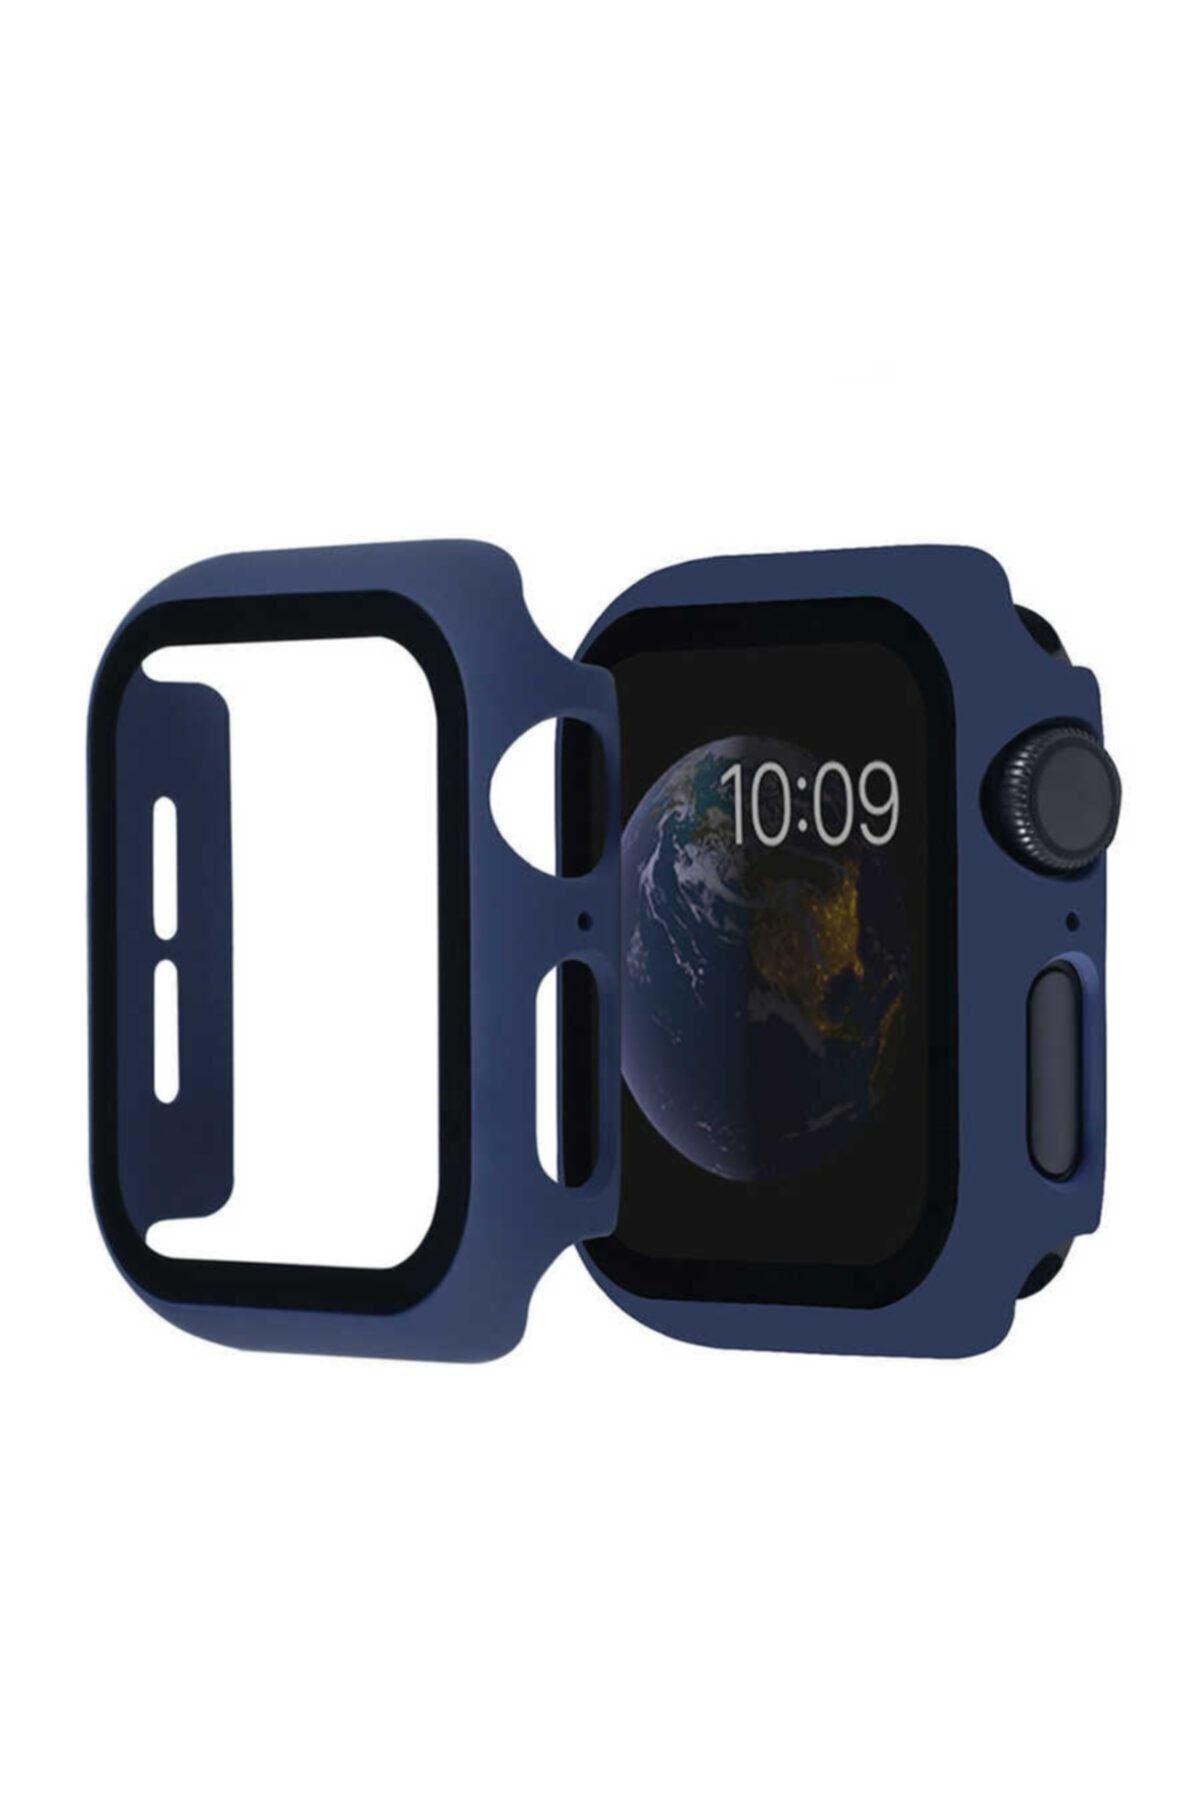 KVK PRİVACY Lacivert Apple Watch 1 2 3 4 5 6 Se Uyumlu 42mm Tam Koruma Silikon Kılıf 1